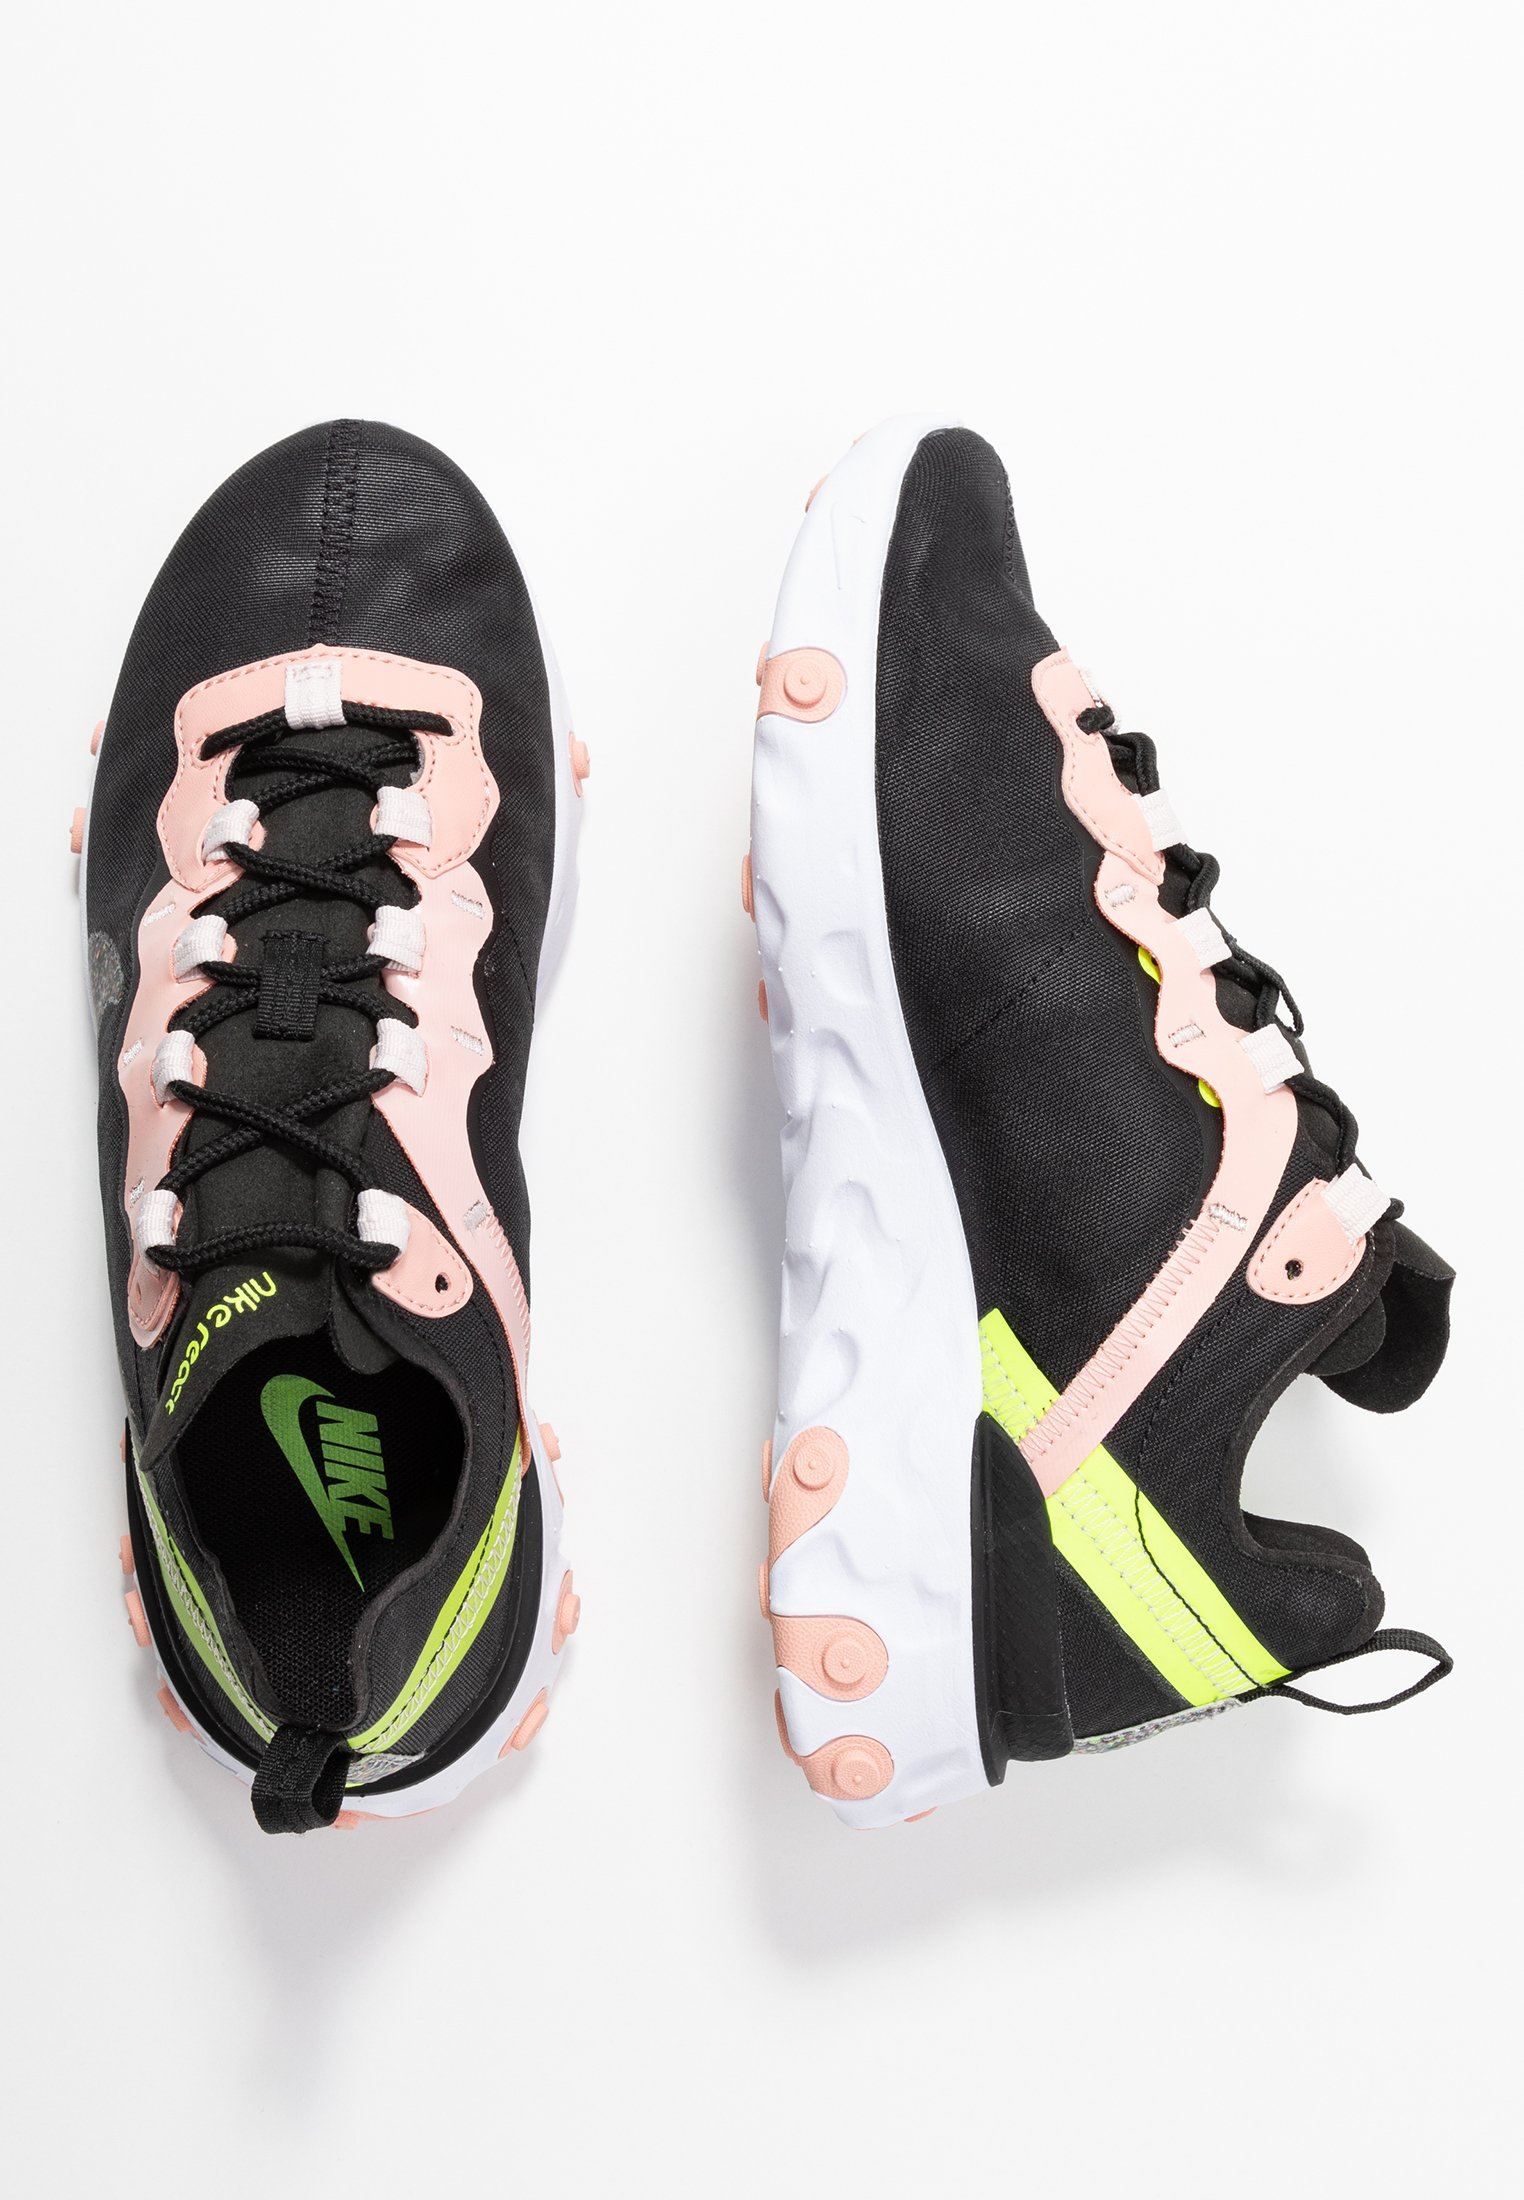 Nike Sportswear React Element 55 Prm - Sneakers Black/volt/coral Stardust/light Soft Pink/white